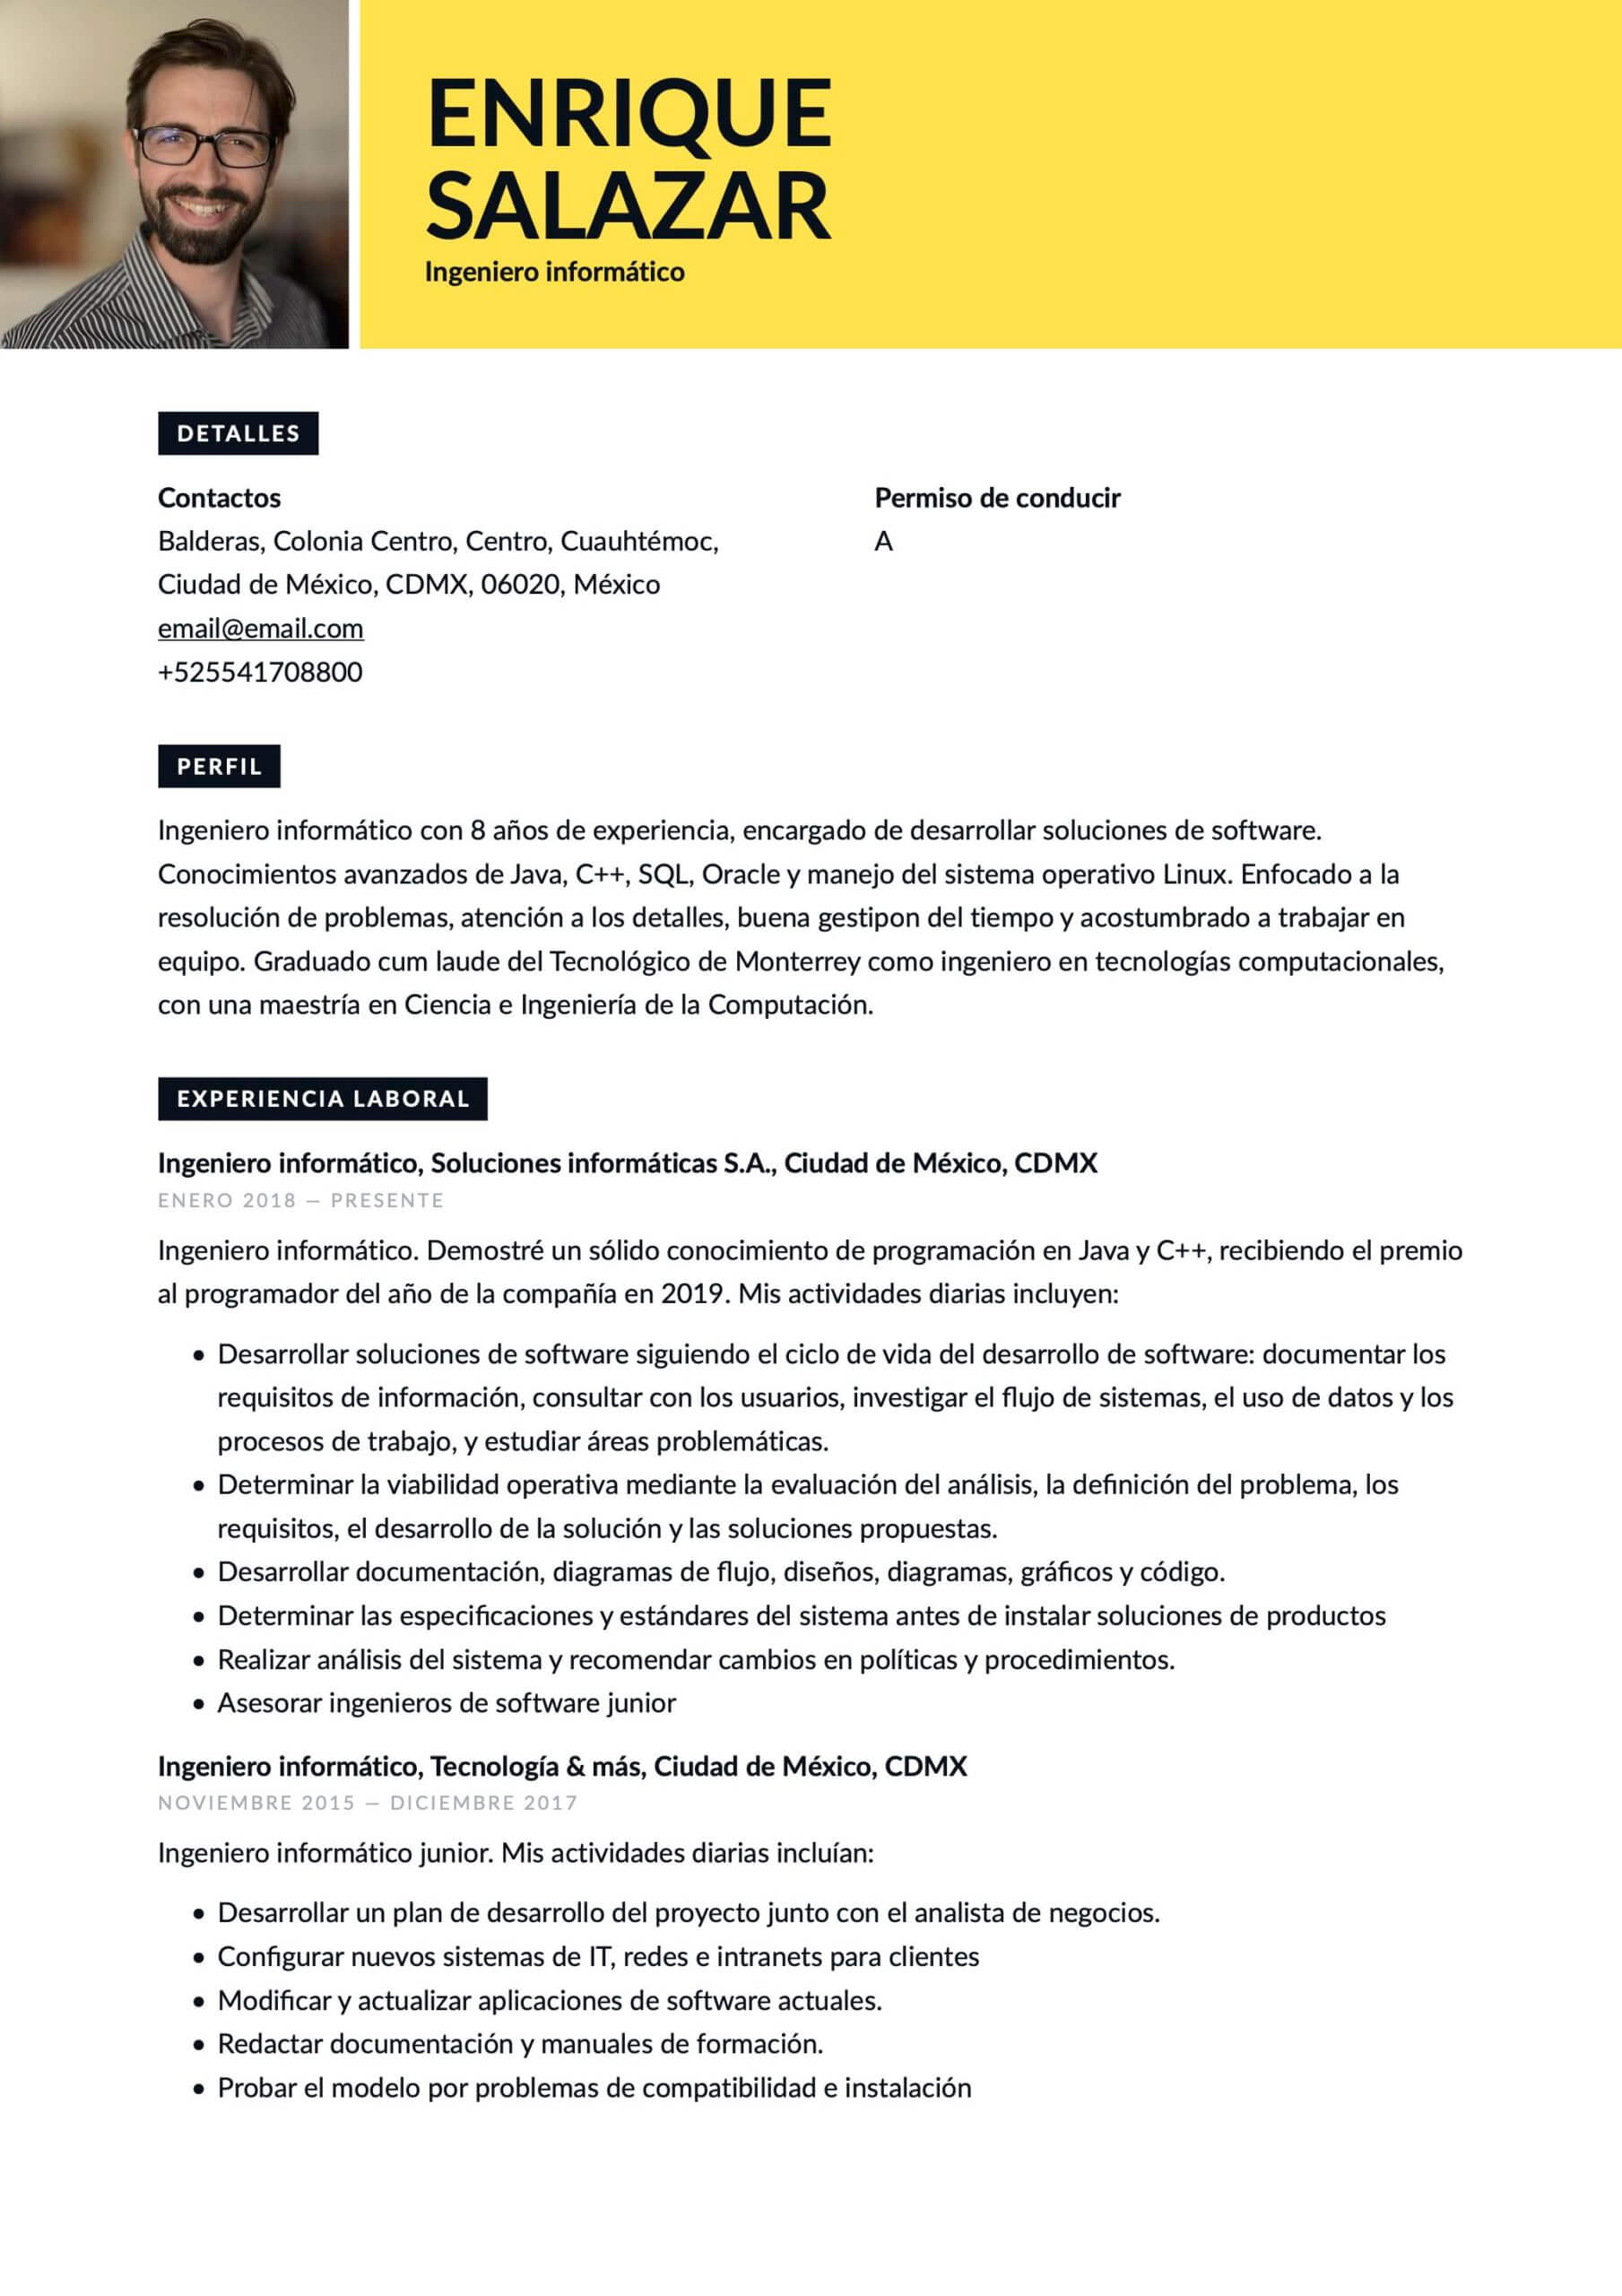 Currículum Ingeniero de software